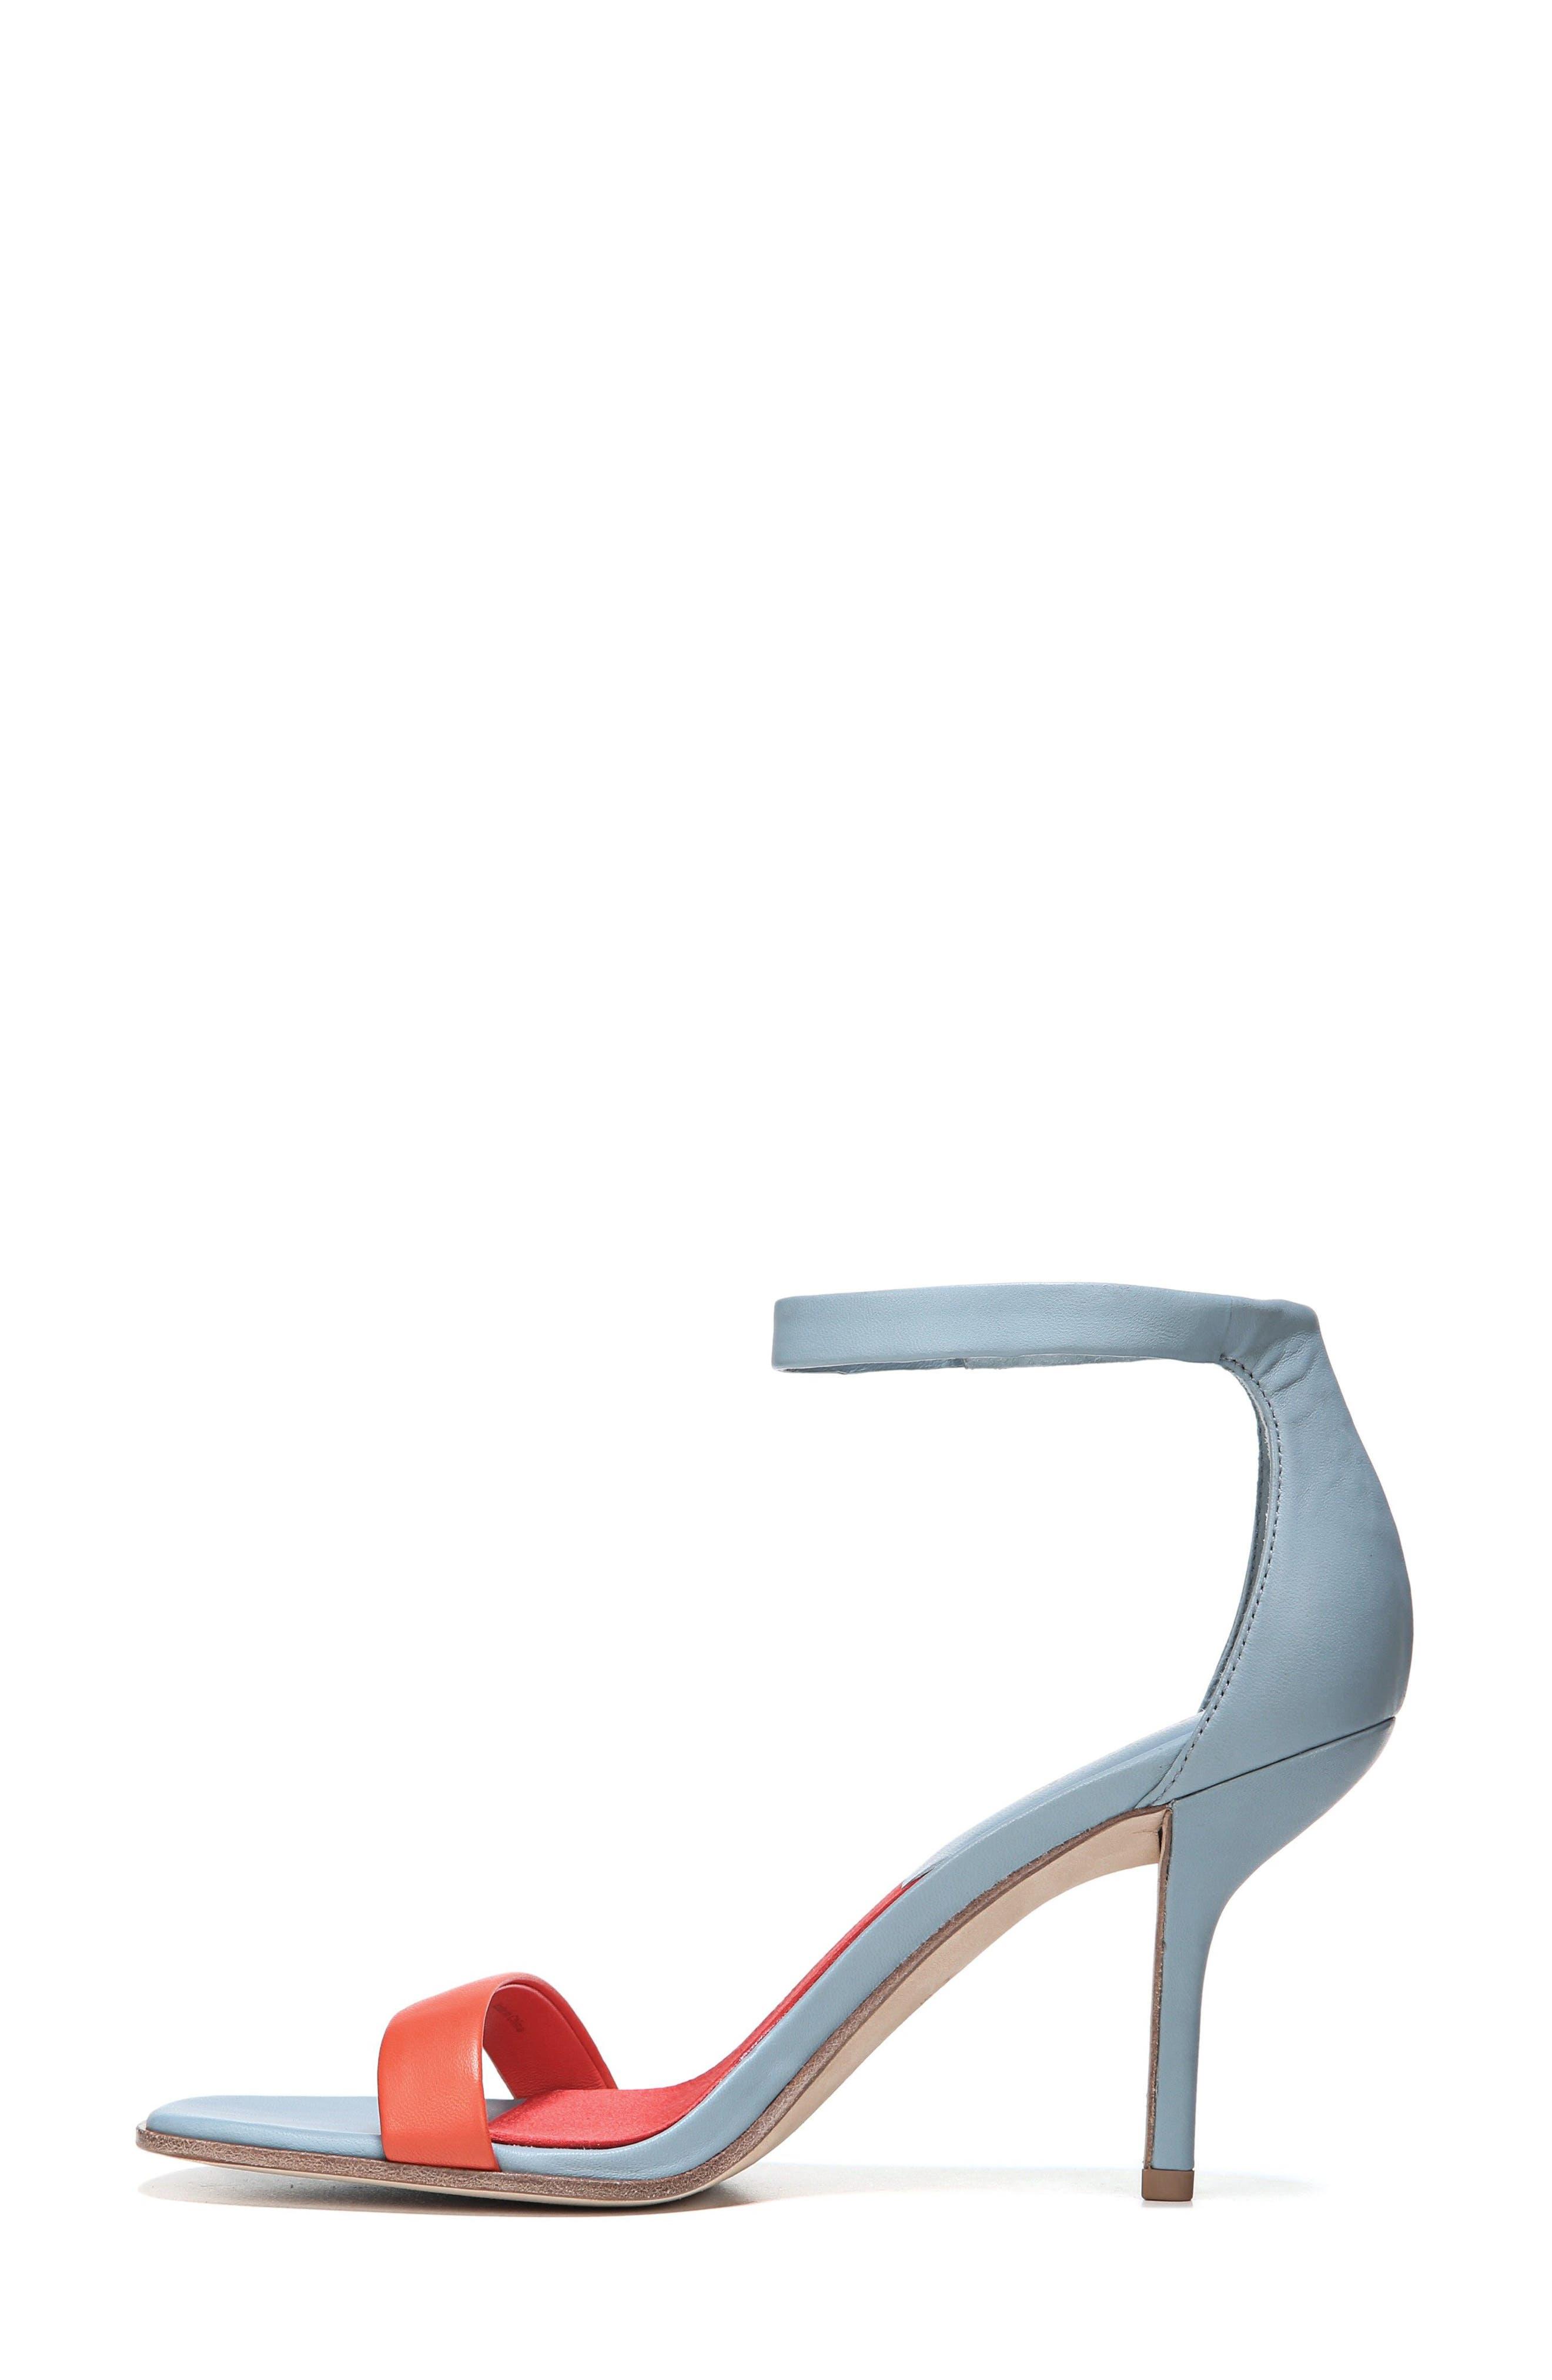 Ferrara Ankle Strap Sandal,                             Alternate thumbnail 8, color,